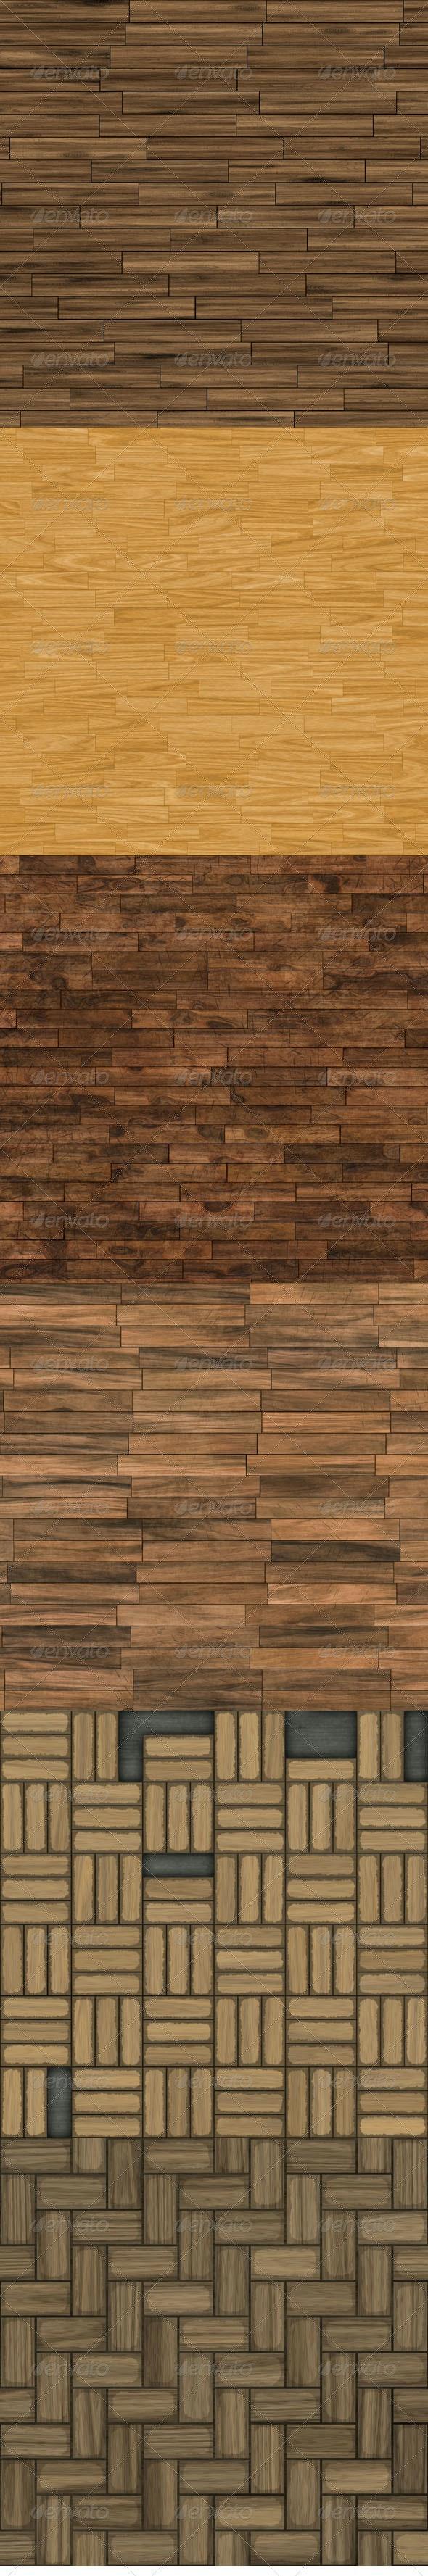 Wooden Backgrounds - Wood Textures